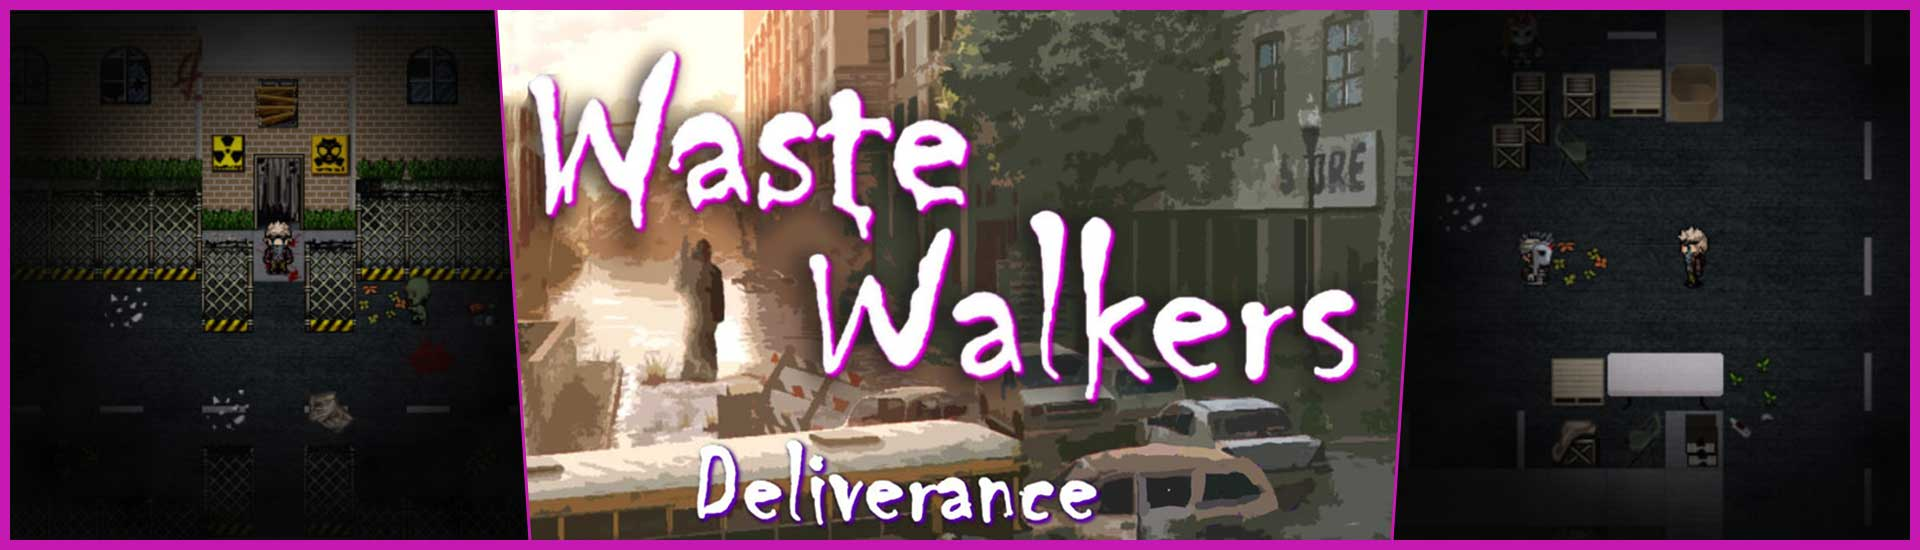 Waste Walkers Deliverance cover